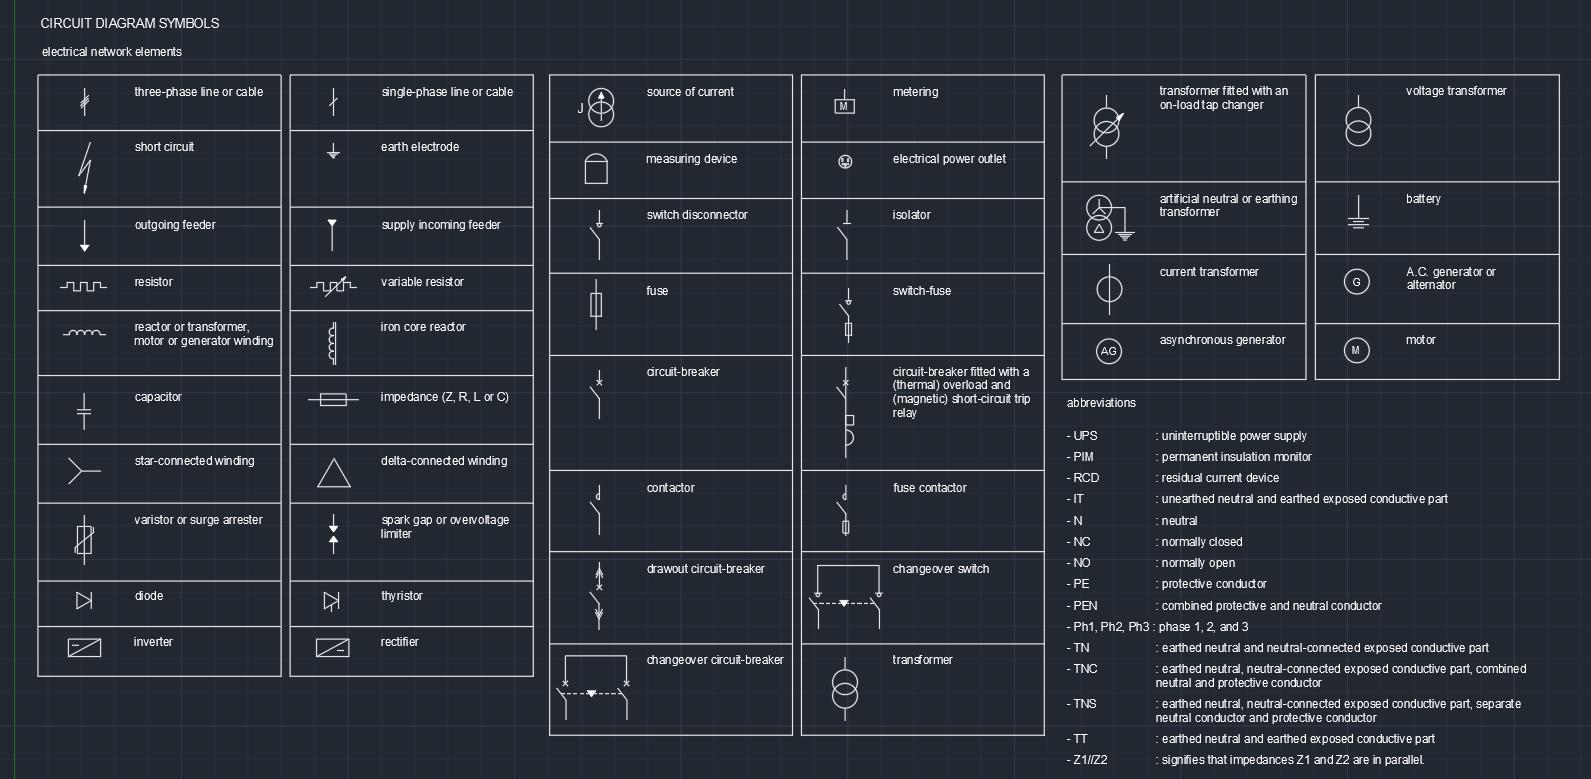 Circuit Diagram Symbols Electrical Network Elements